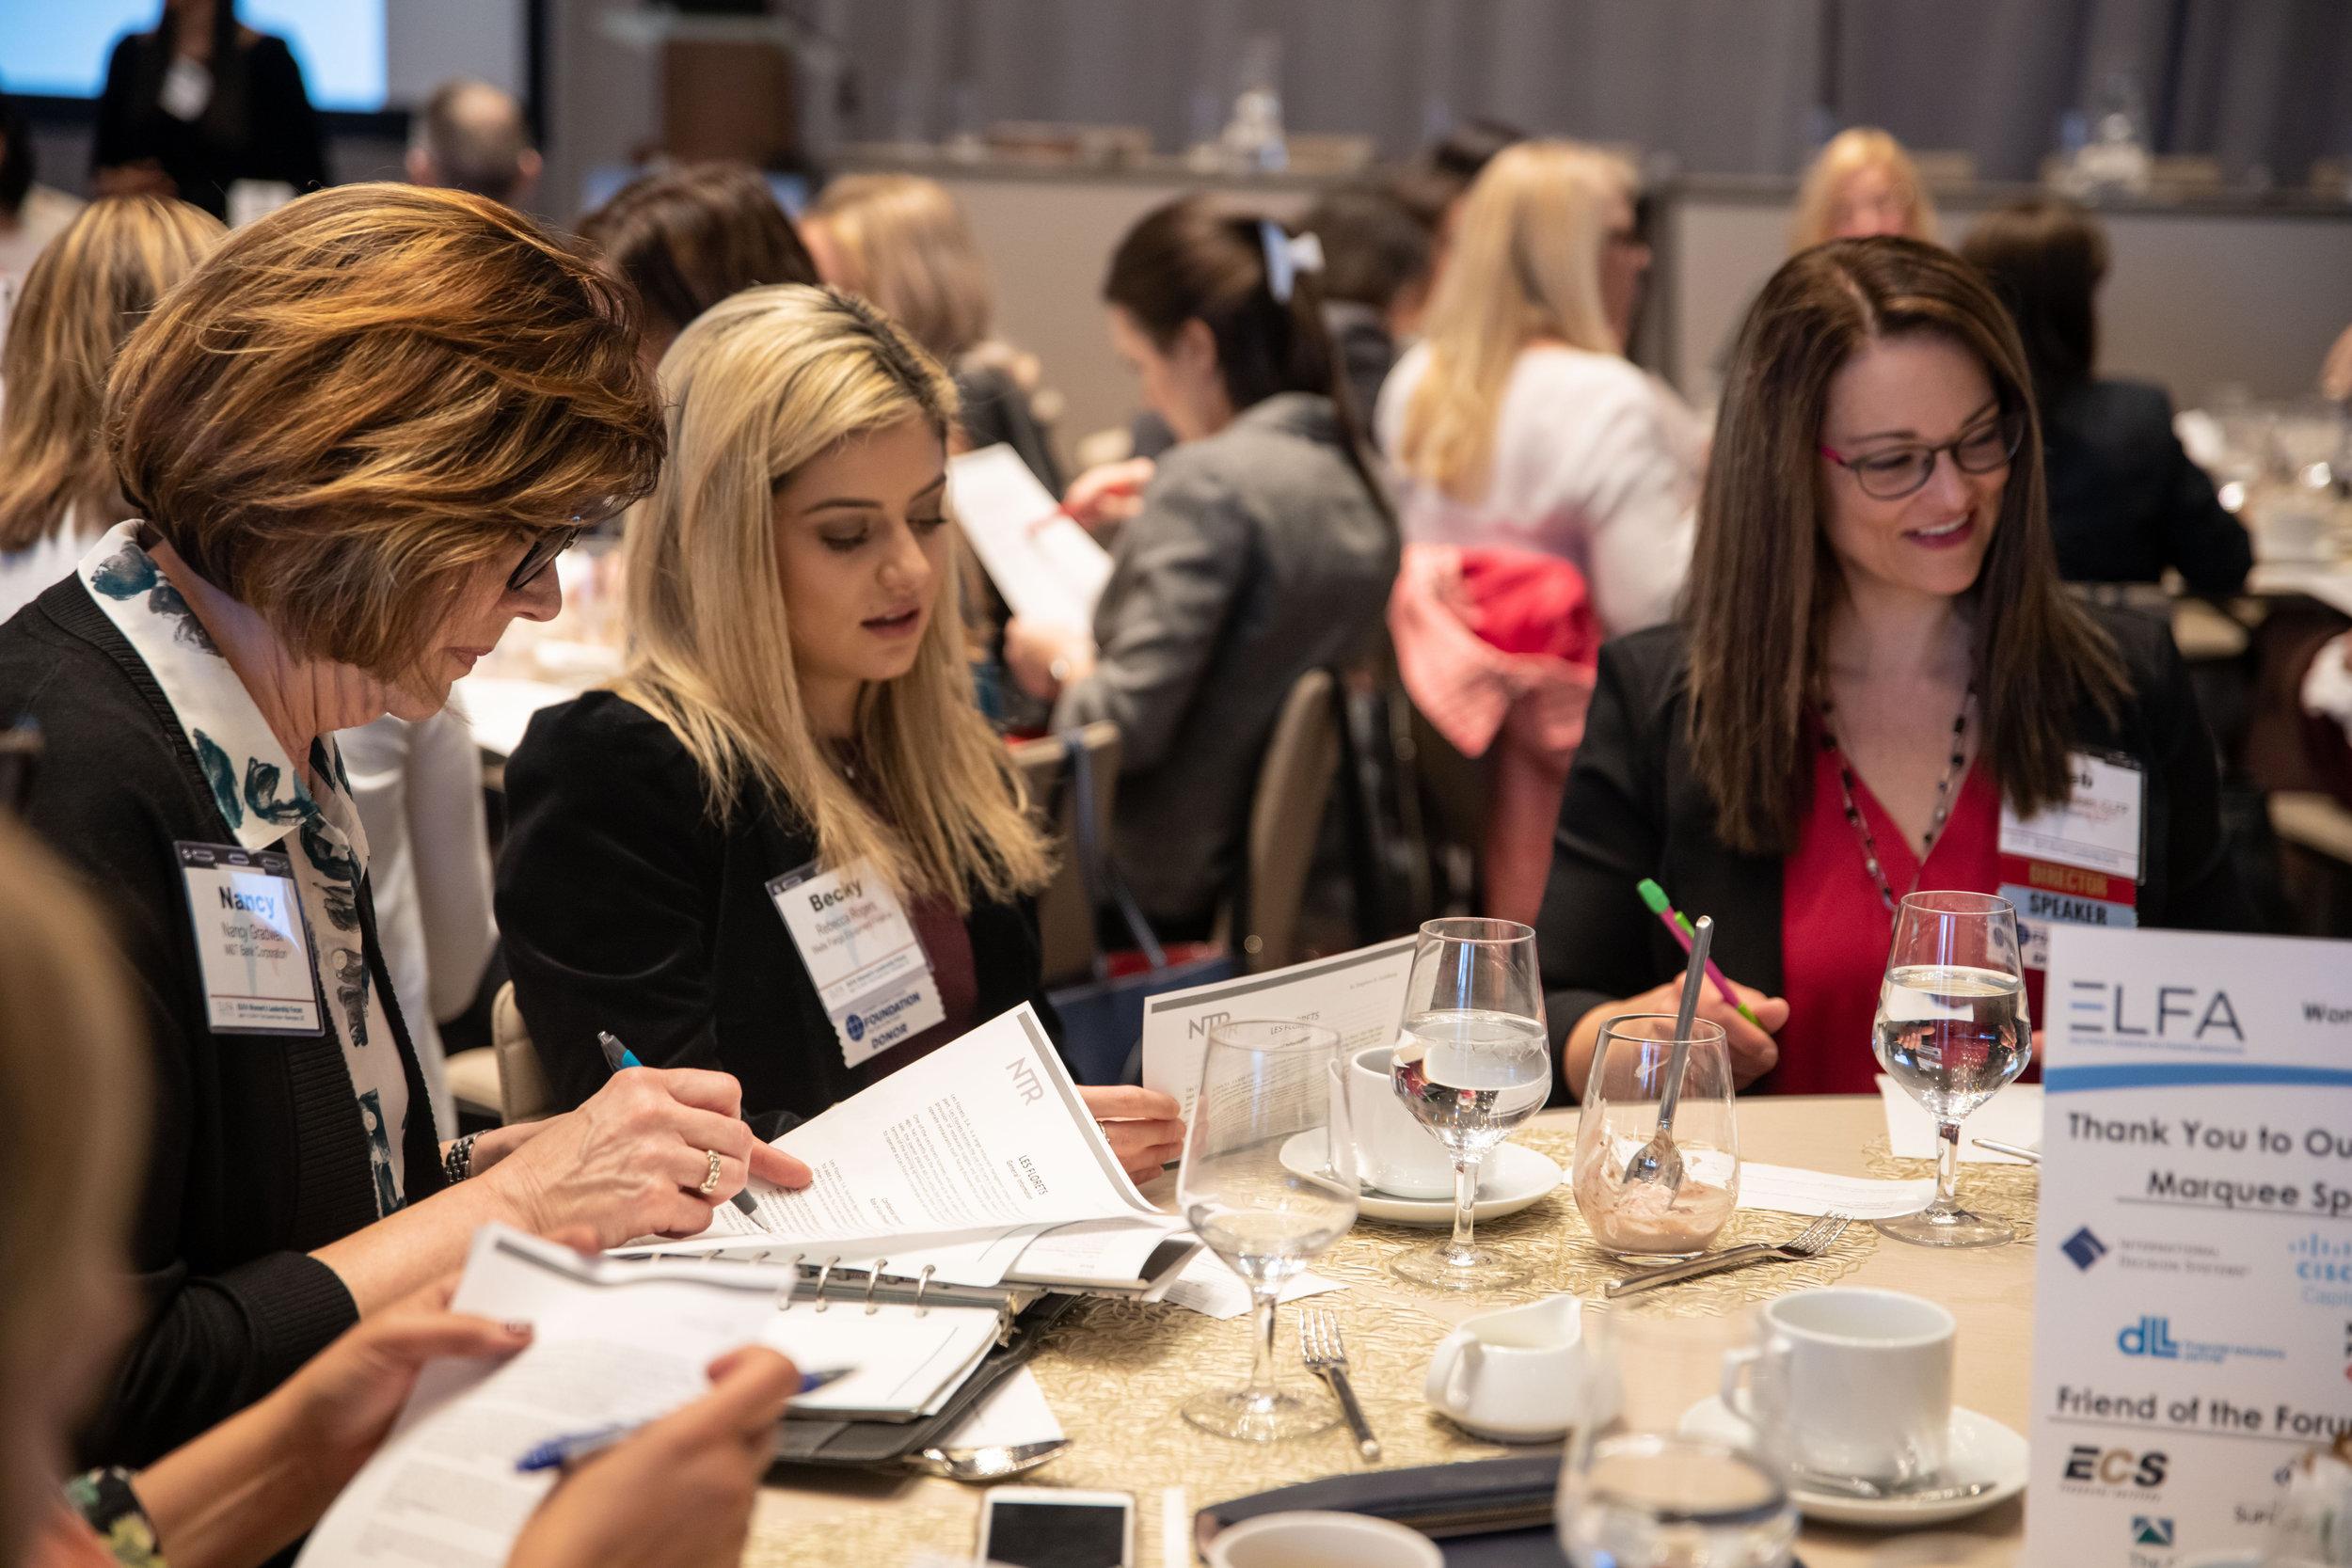 (L-R) Nancy Gradwell, Rebecca Rogers, and Deborah Reuben roleplay at a Women's Leadership Forum workshop